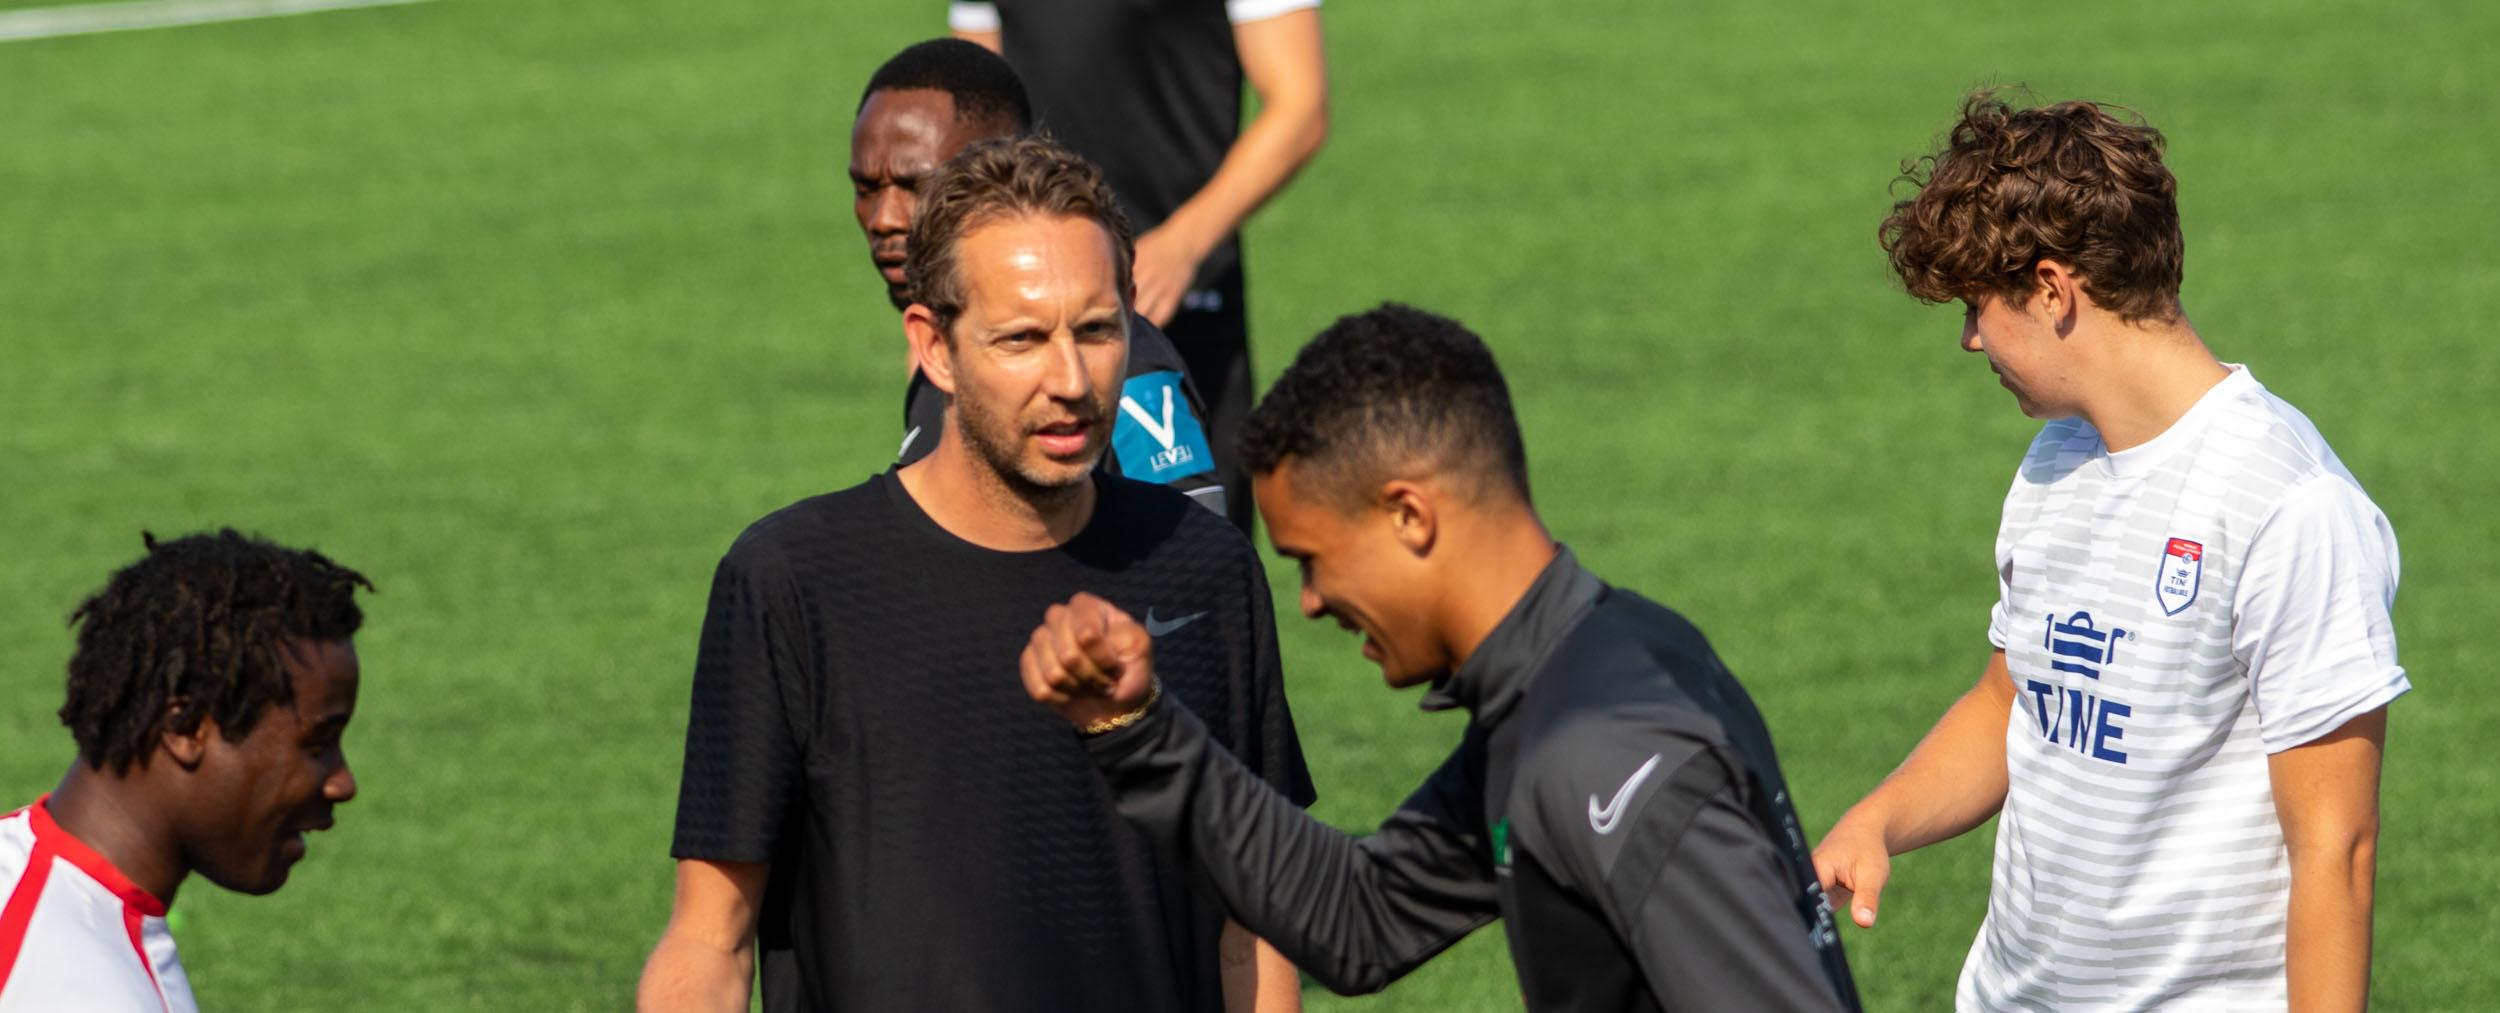 https://www.flintfotball.no/wp-content/uploads/2021/07/Trening-juli-2021-med-Morten-Ramm2.jpg